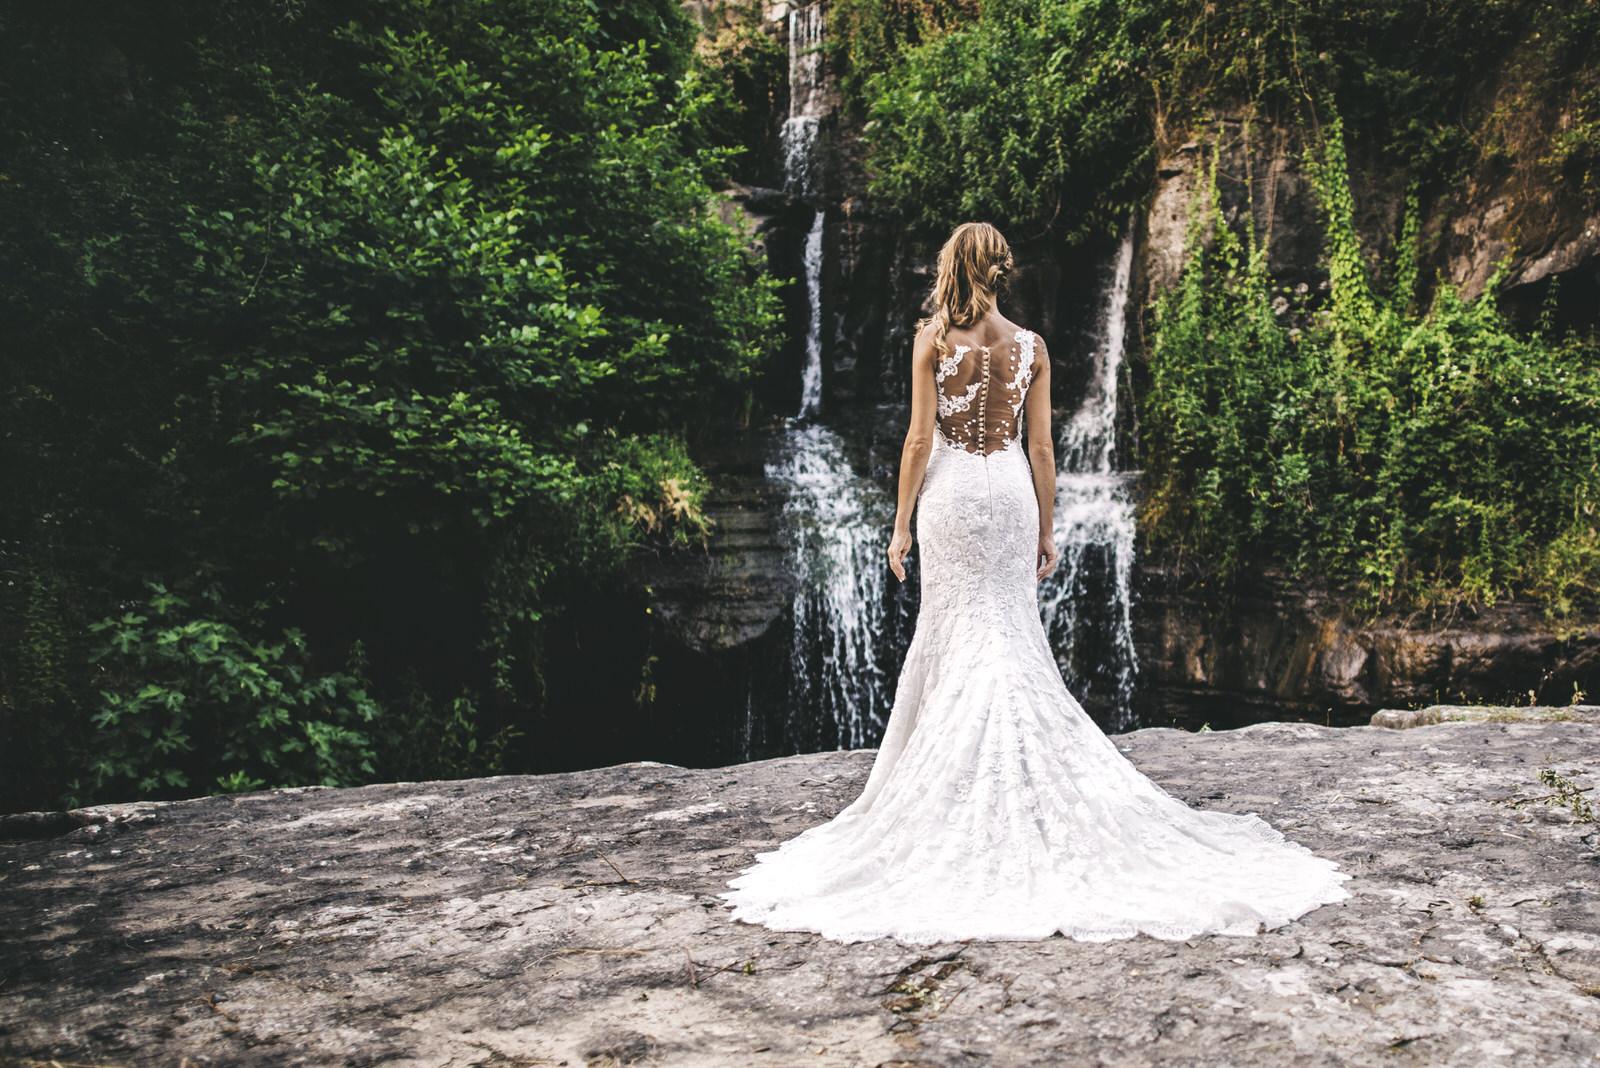 wedding photographer in italy-venice-tuscany-florence-amalfi coast-como lake-villa del balbianello-siena-amalfi-ravello-belmond-villa cimbrone18